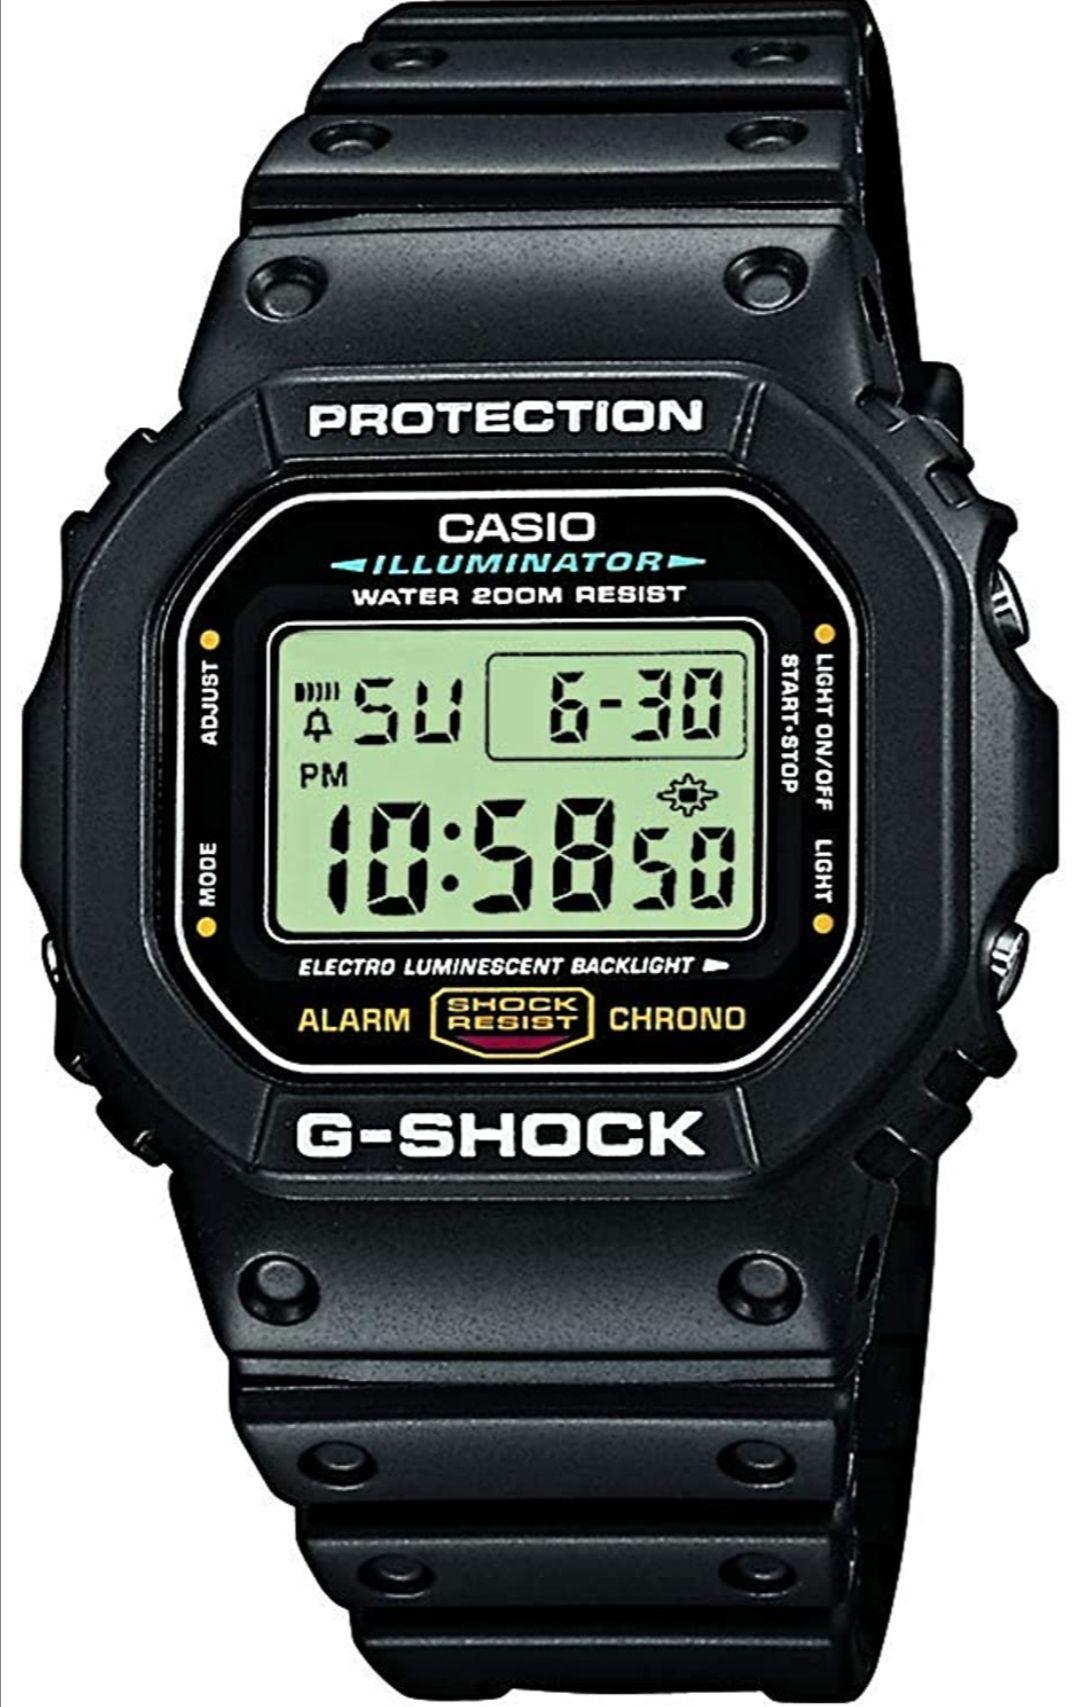 Casio G-Shock Watch DW-5600E-1VER £58.08 (UK Mainland) via Amazon EU on Amazon